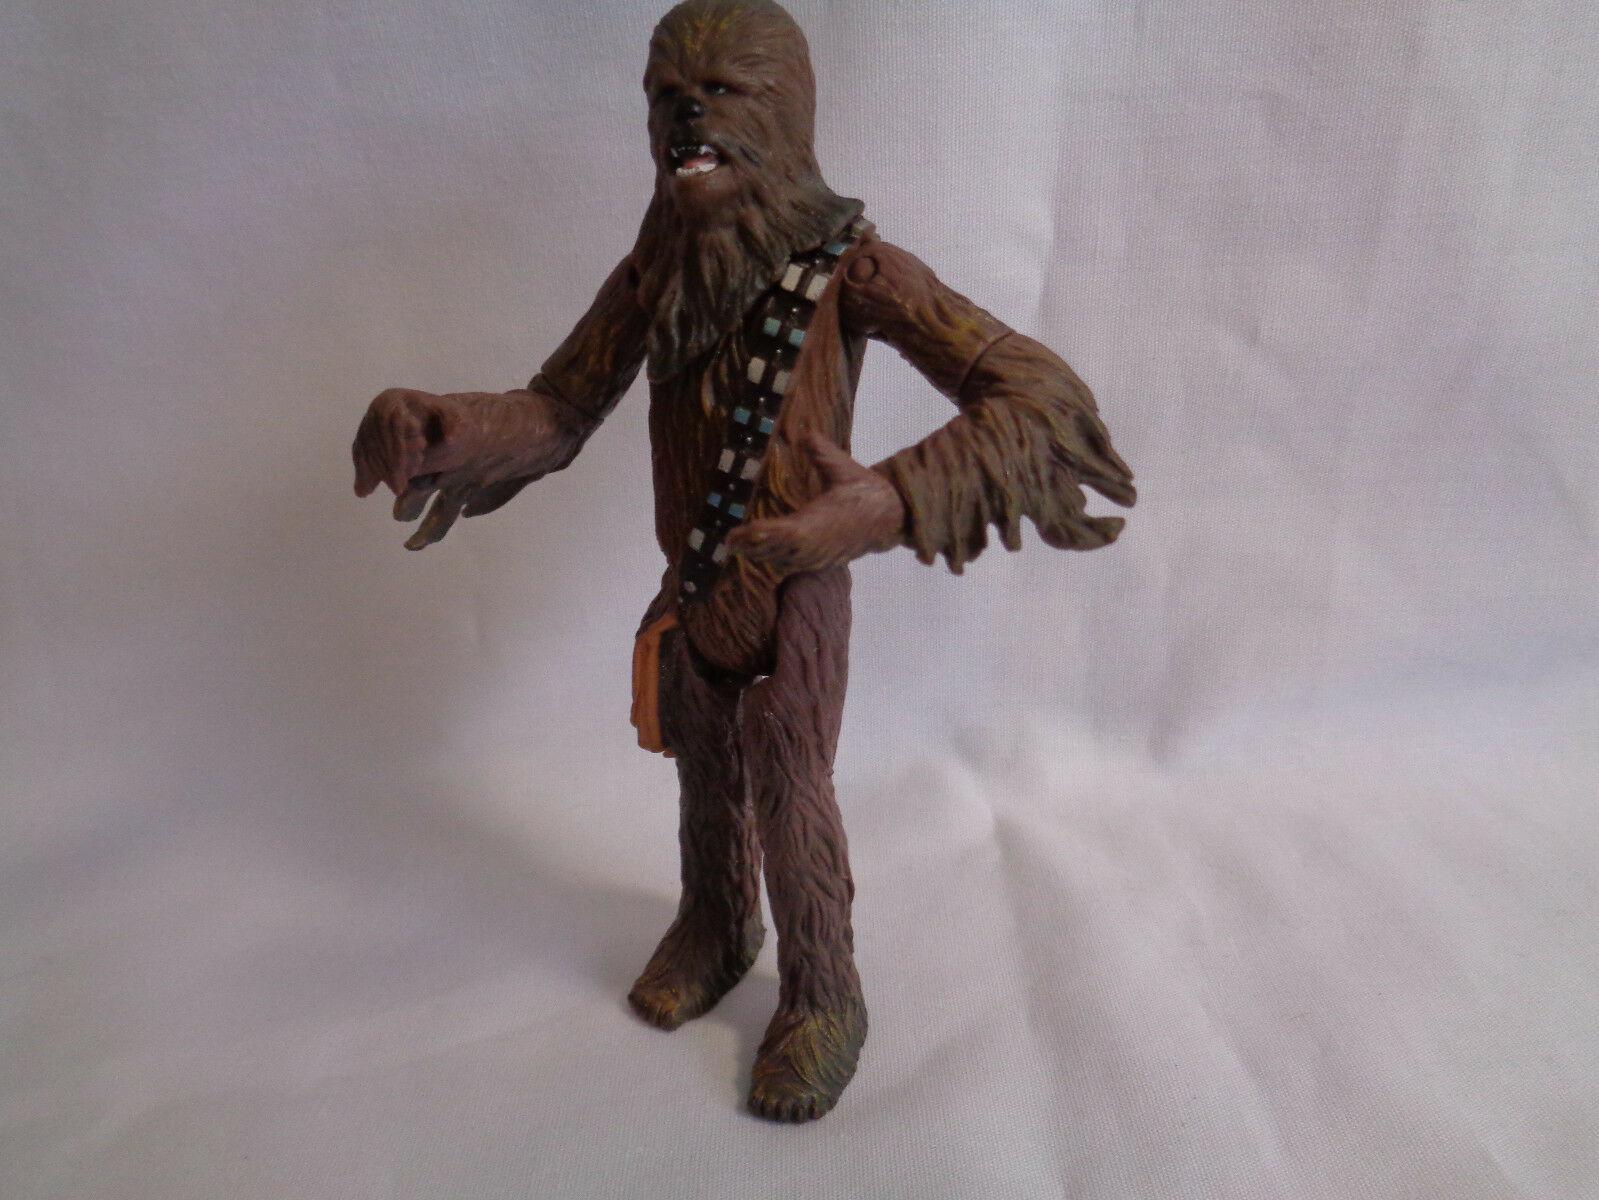 2001 Hasbro Star Wars Chewbacca Action Figure image 4